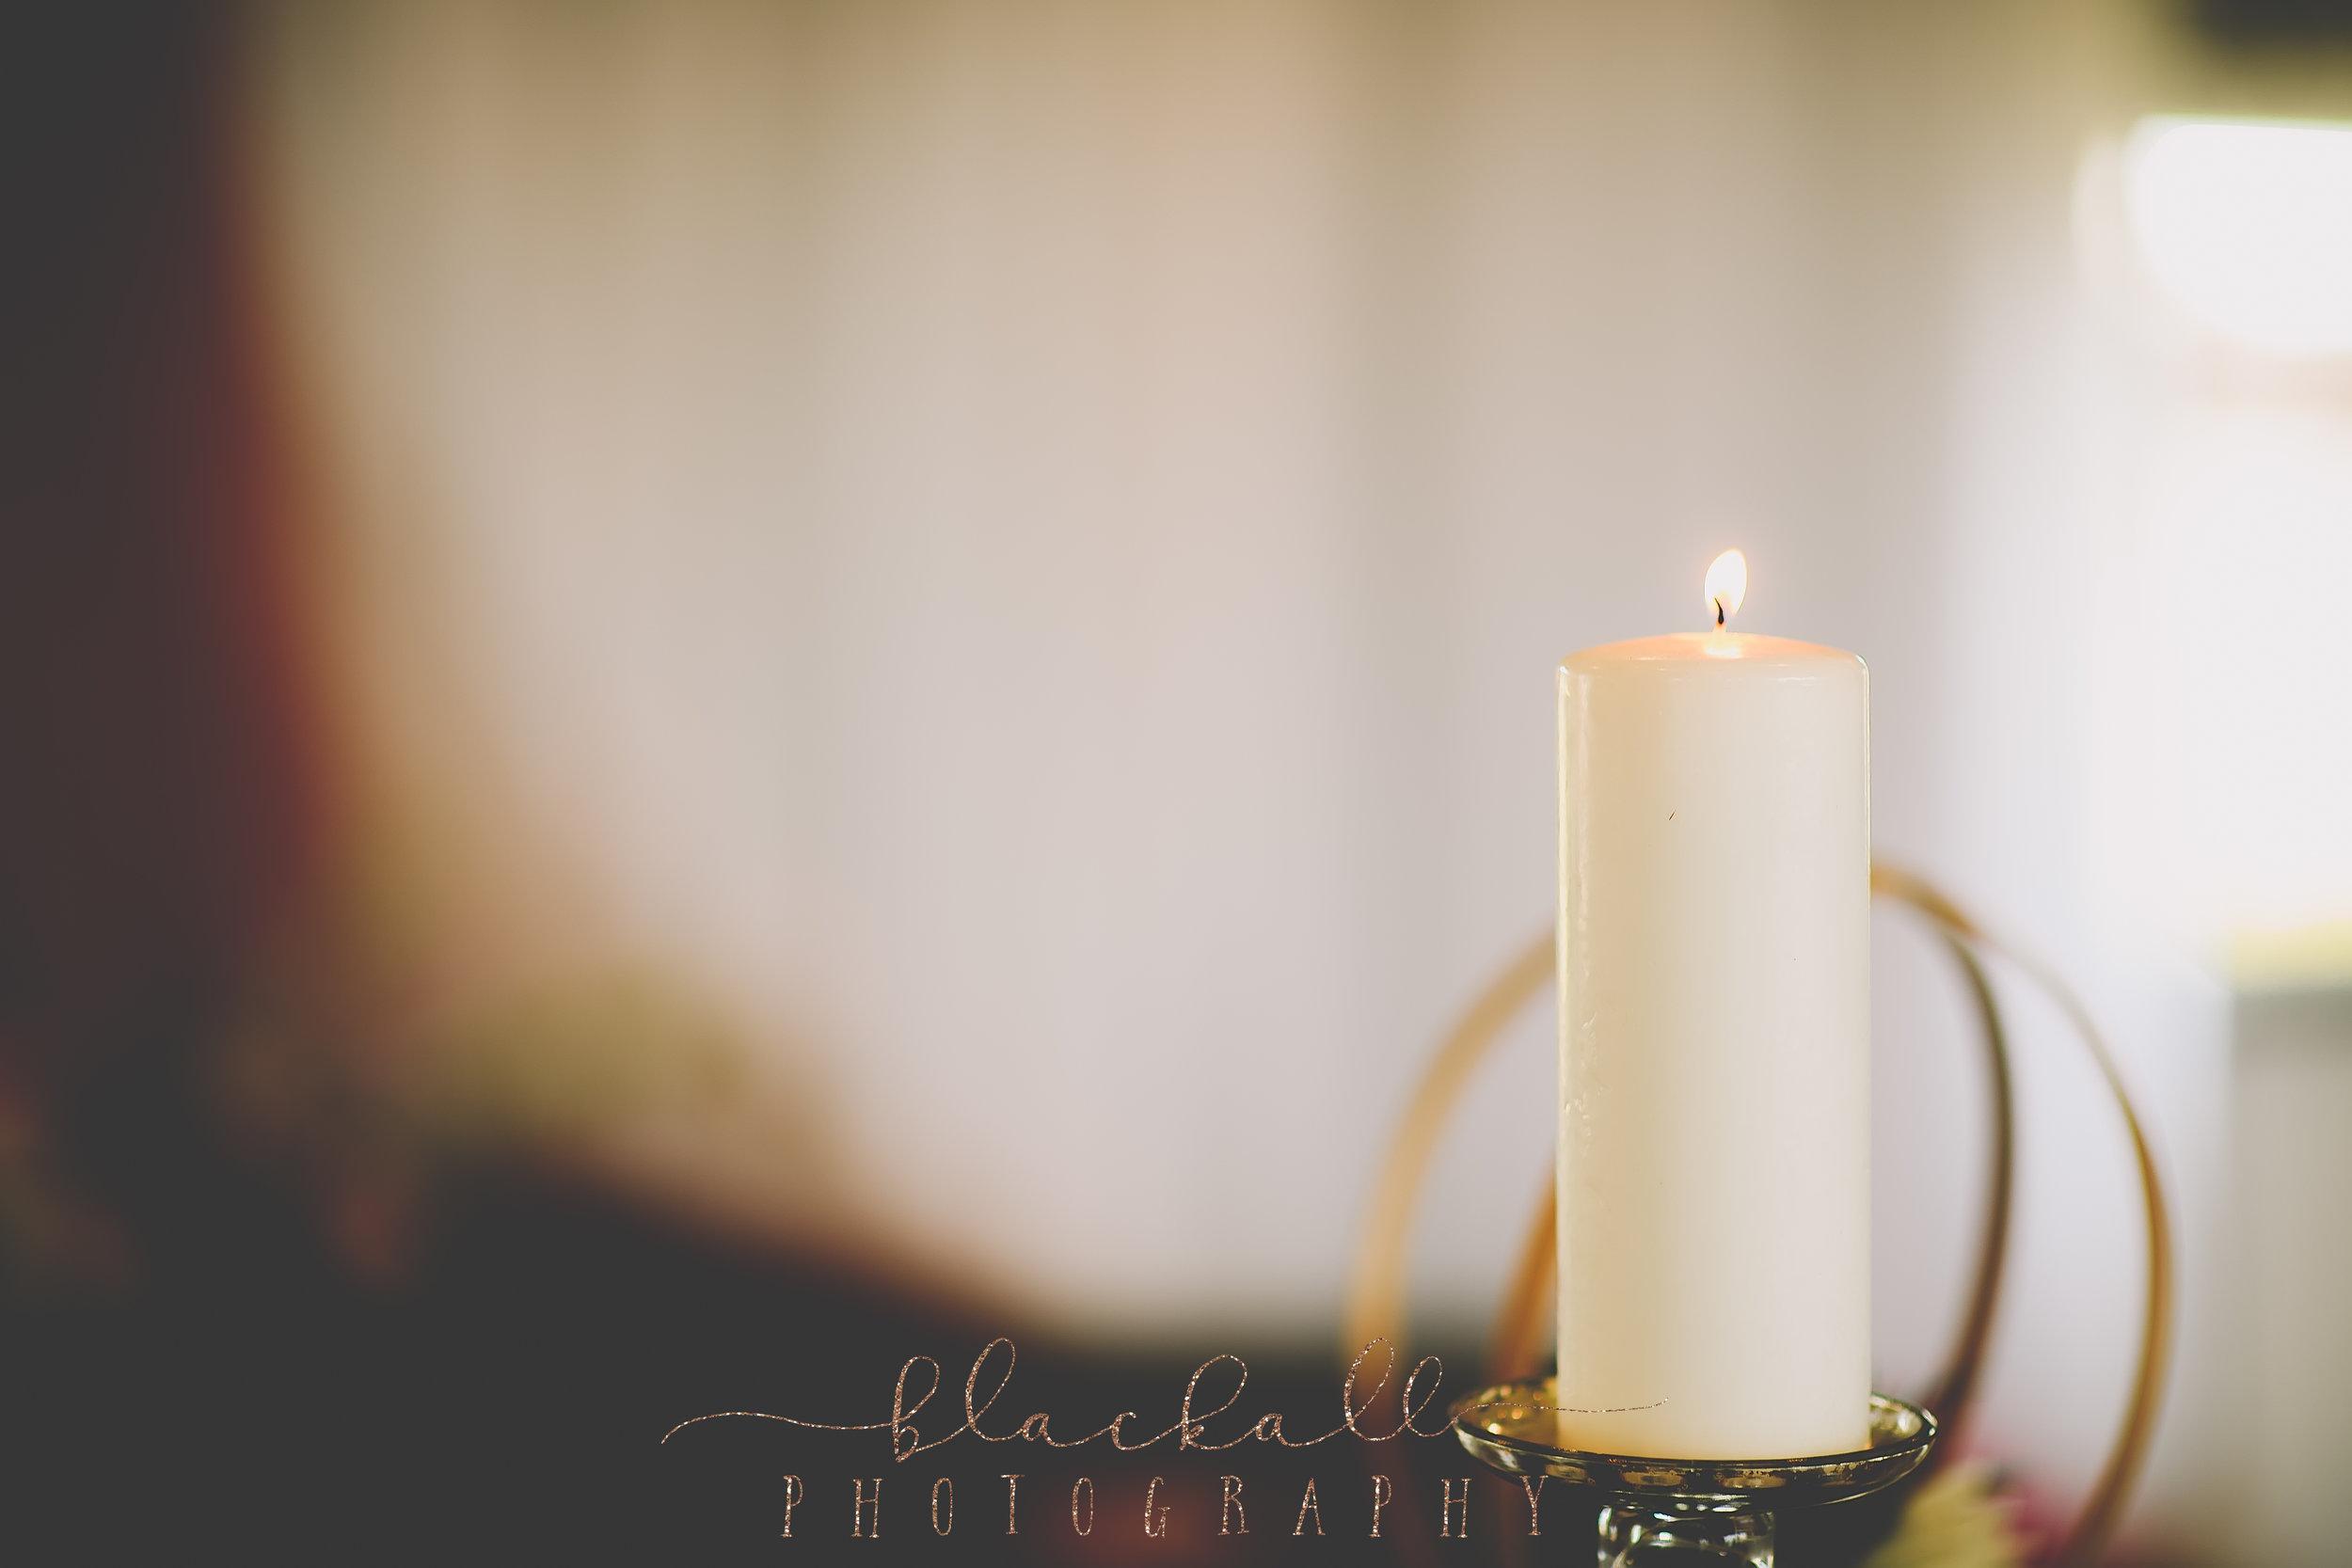 HHR_BlackallPhotography_7.JPG